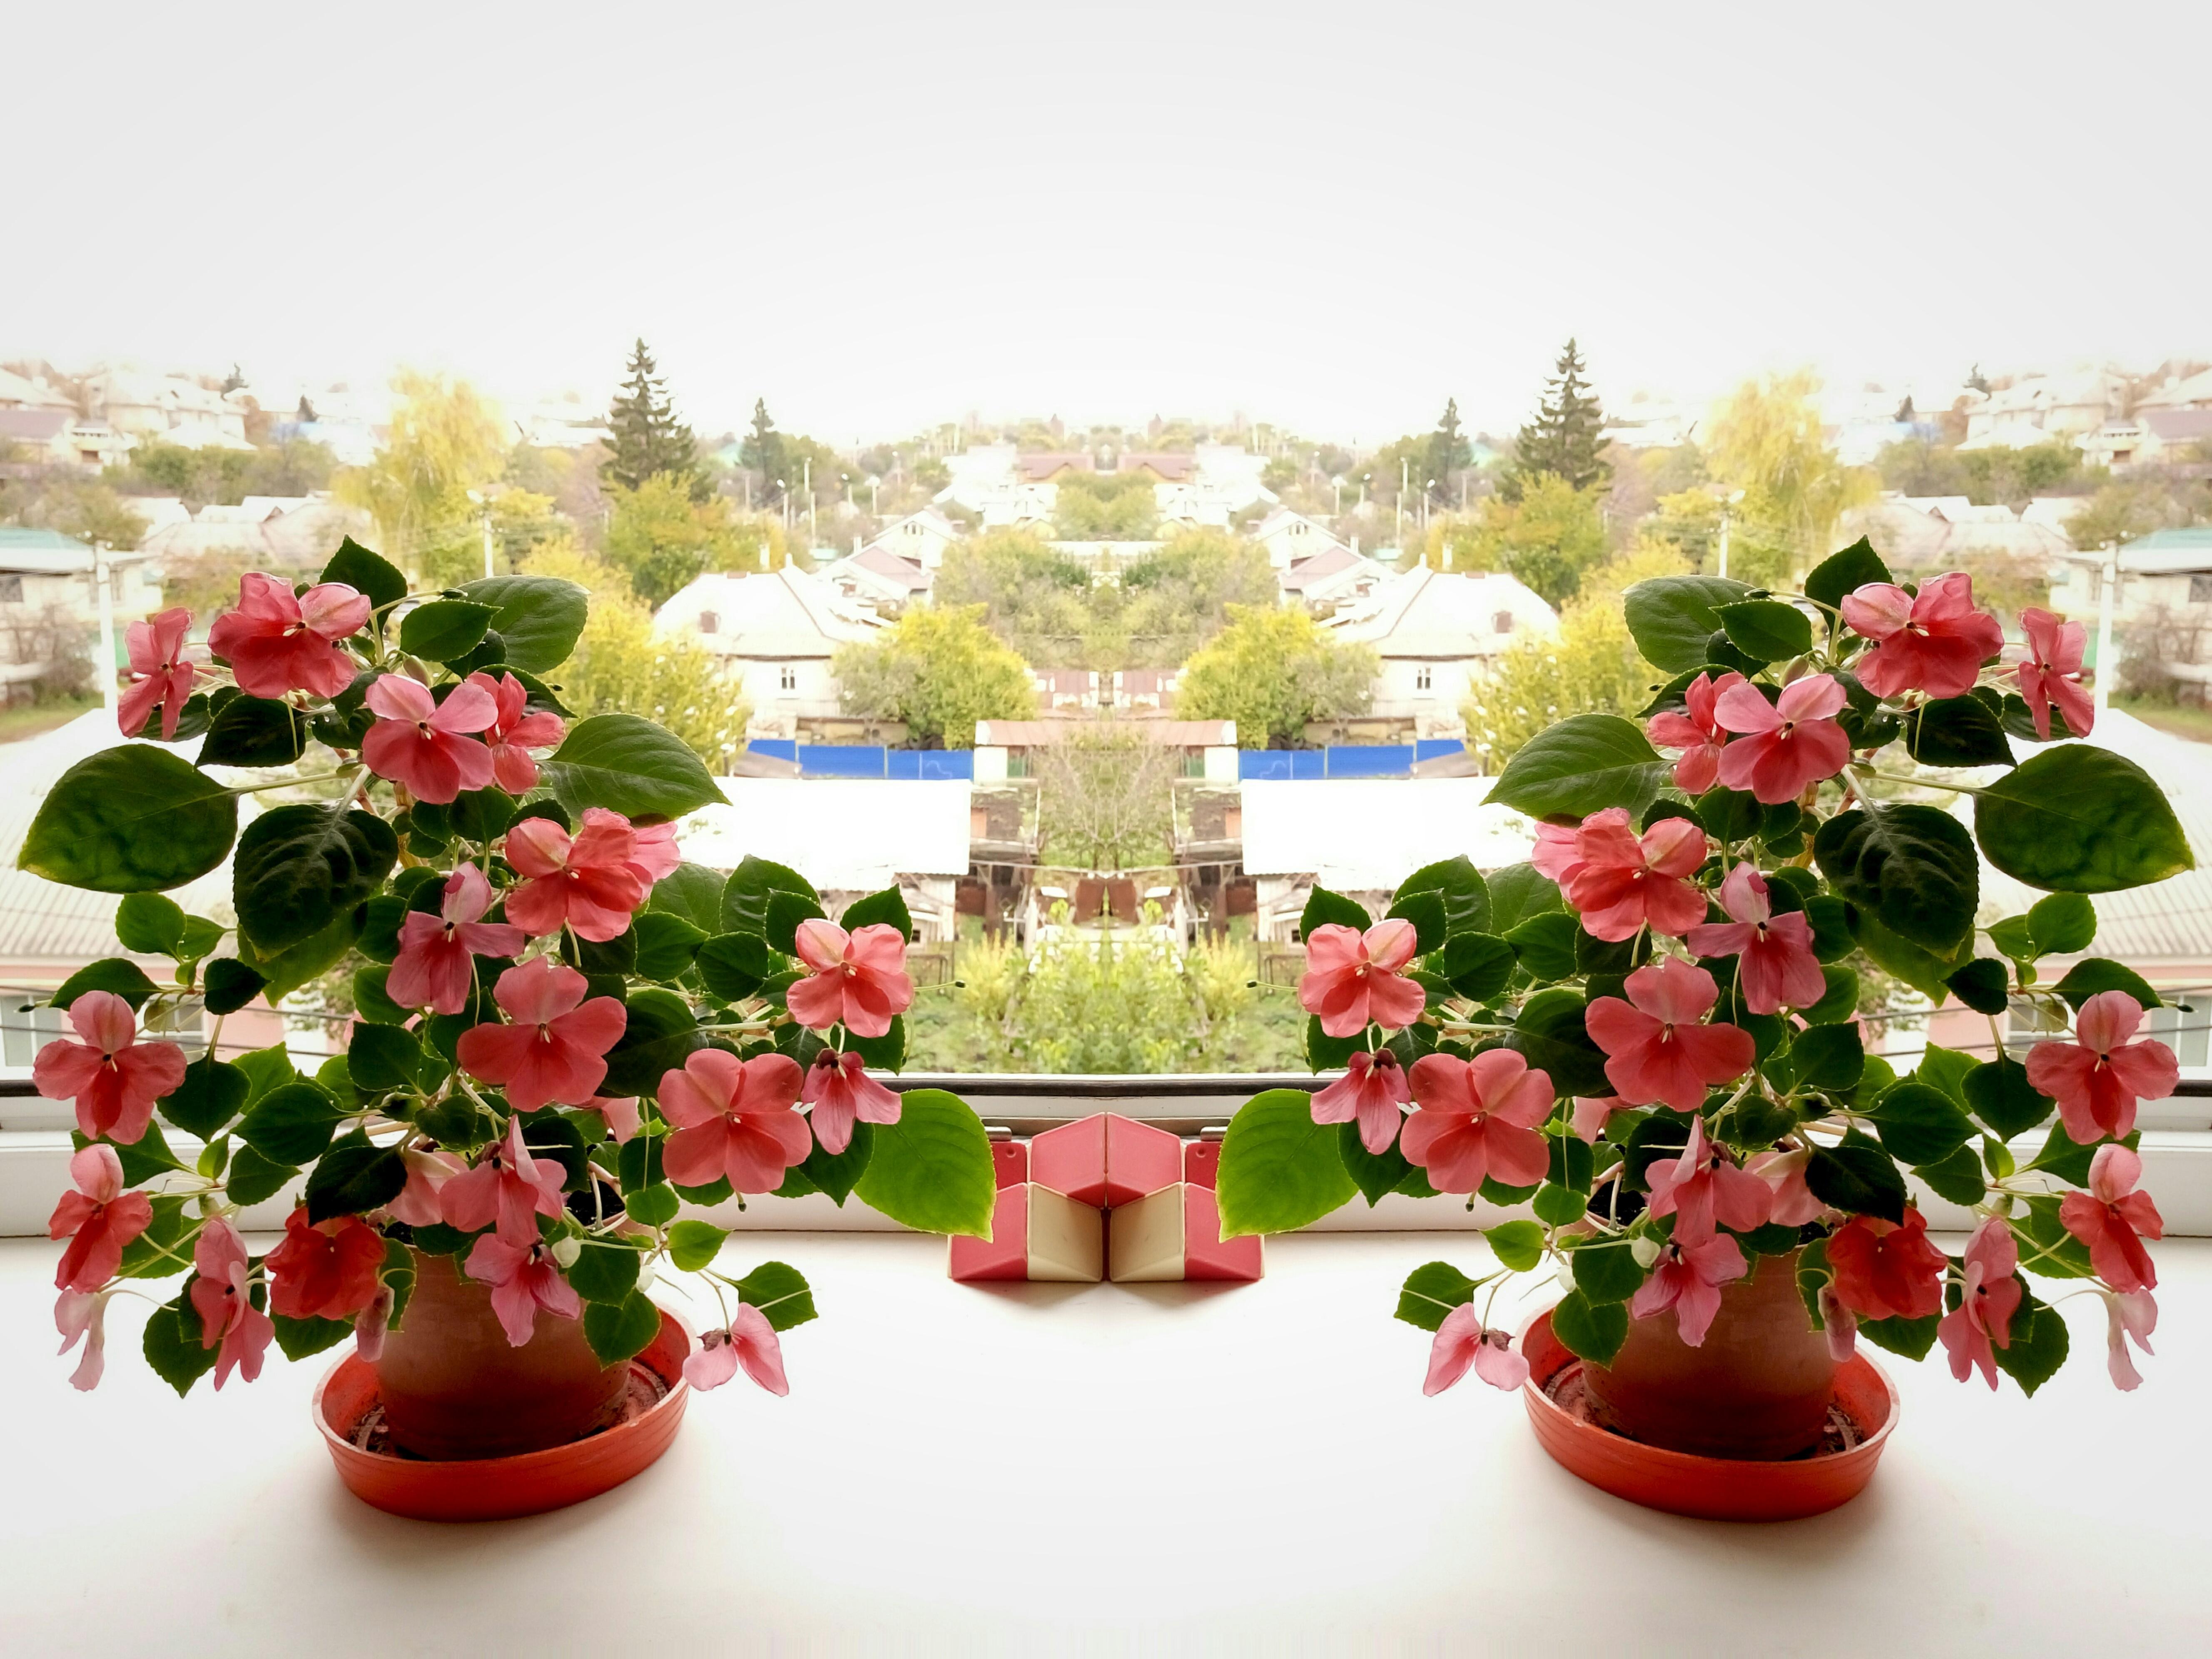 kostenlose foto natur licht blume bl tenblatt bl hen rot rosa flora blumenbl tter. Black Bedroom Furniture Sets. Home Design Ideas